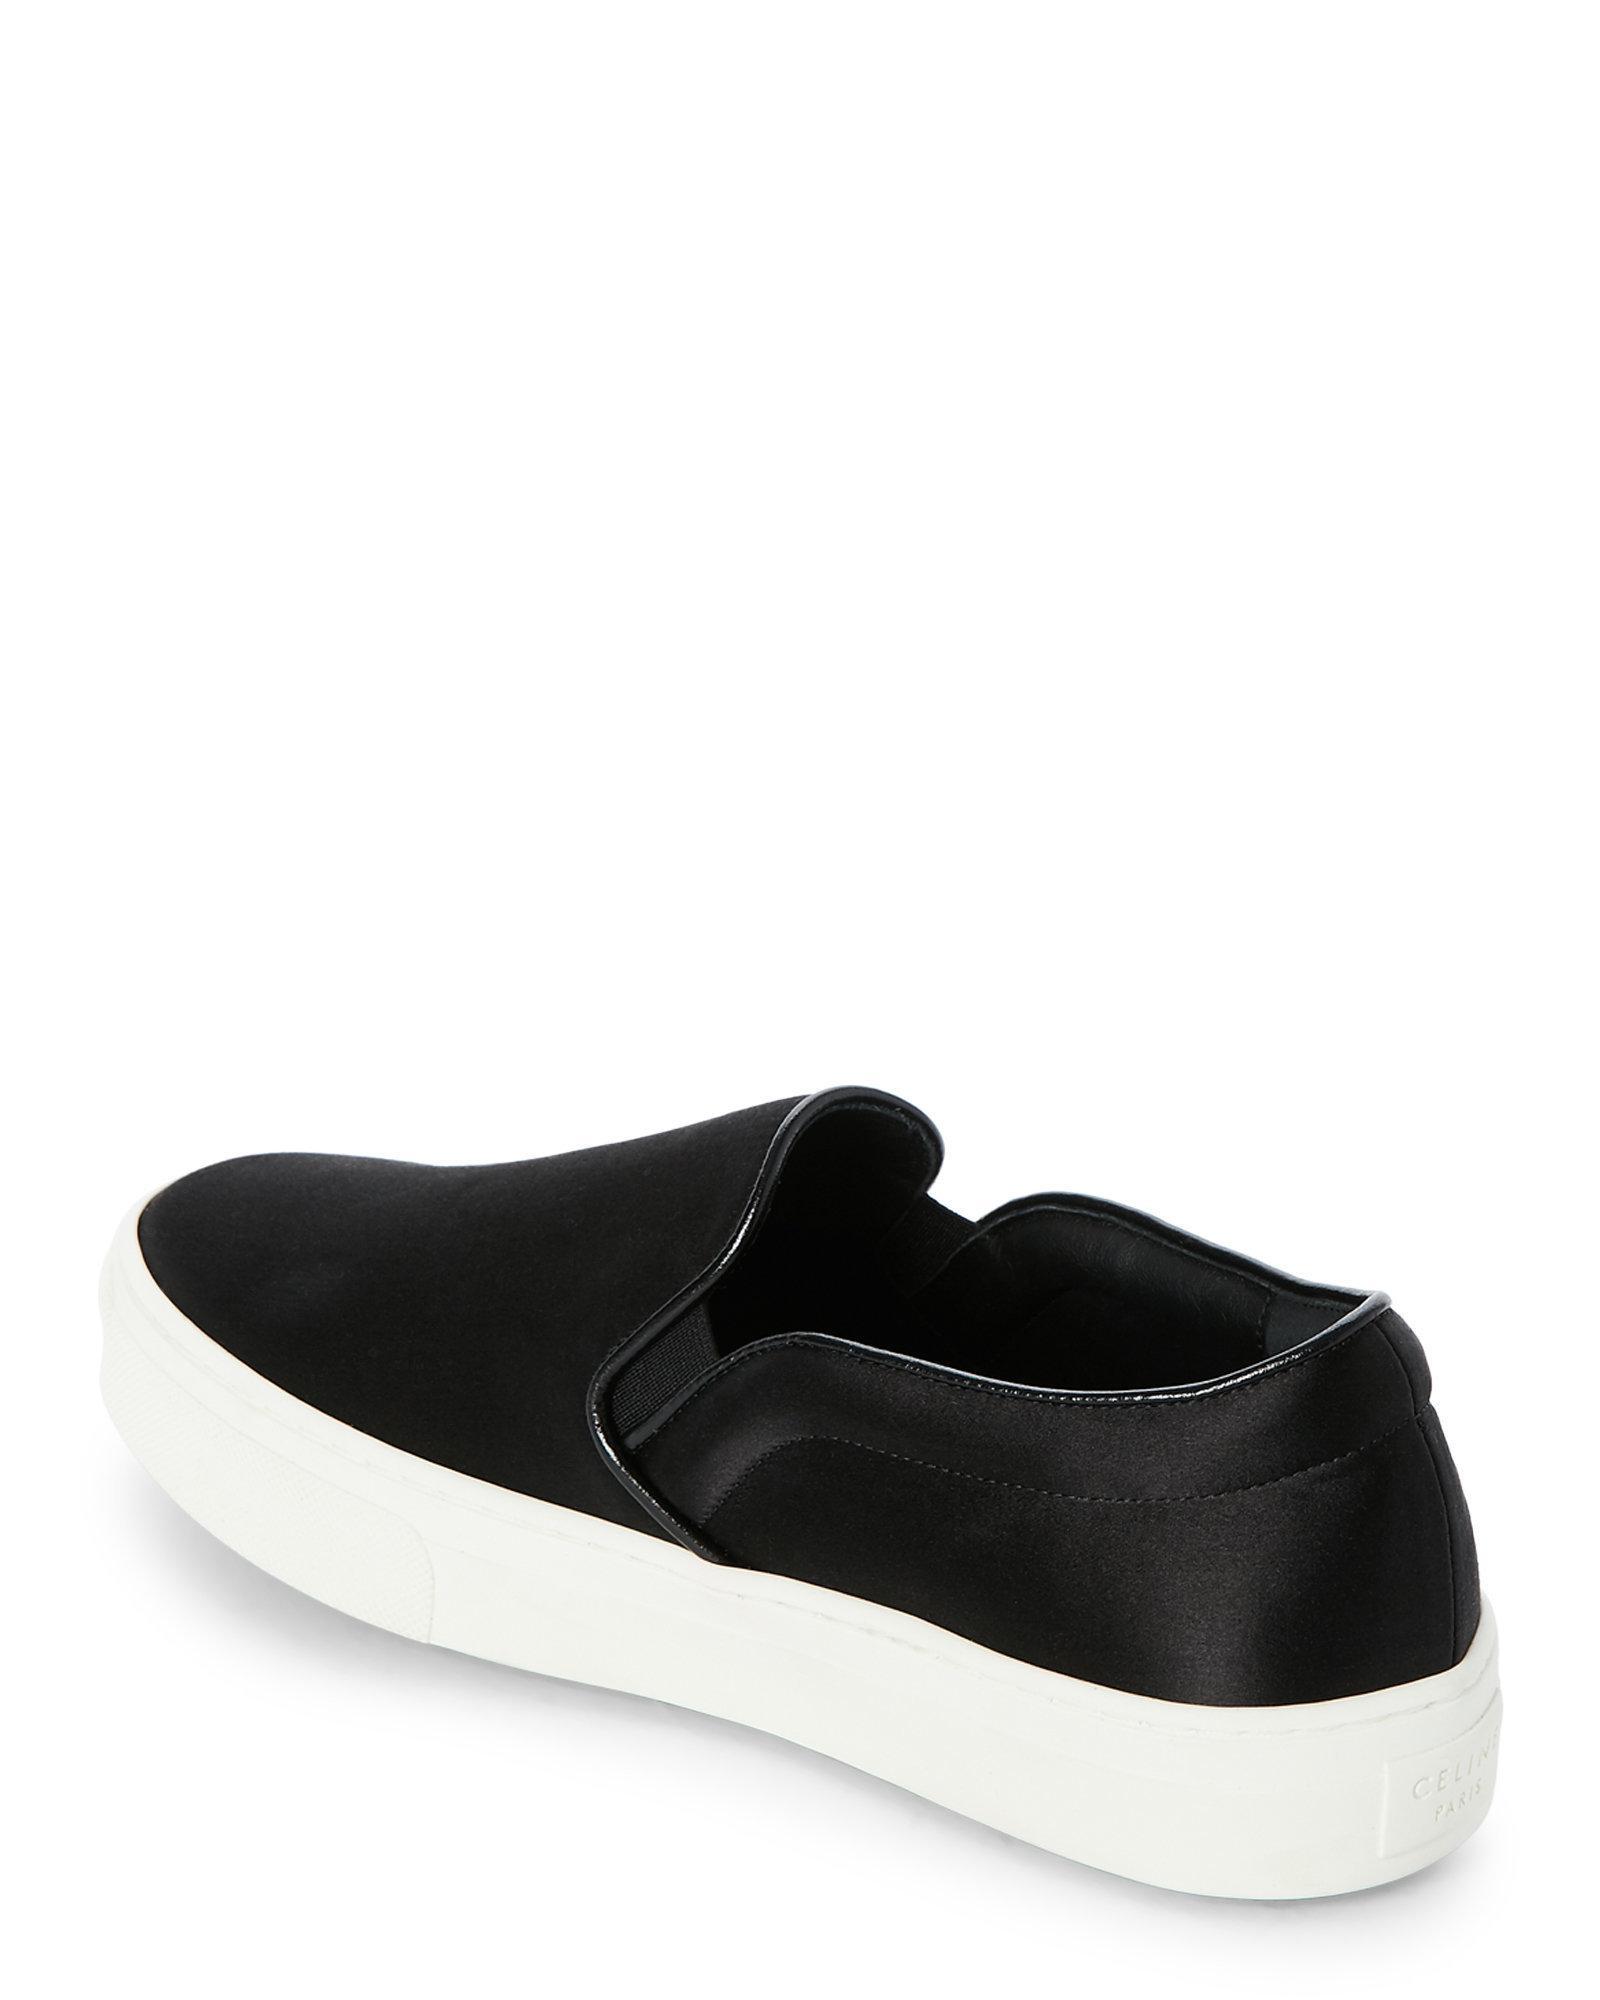 179066568f2c Lyst - Céline Black Satin Platform Slip On Sneakers in Black for Men